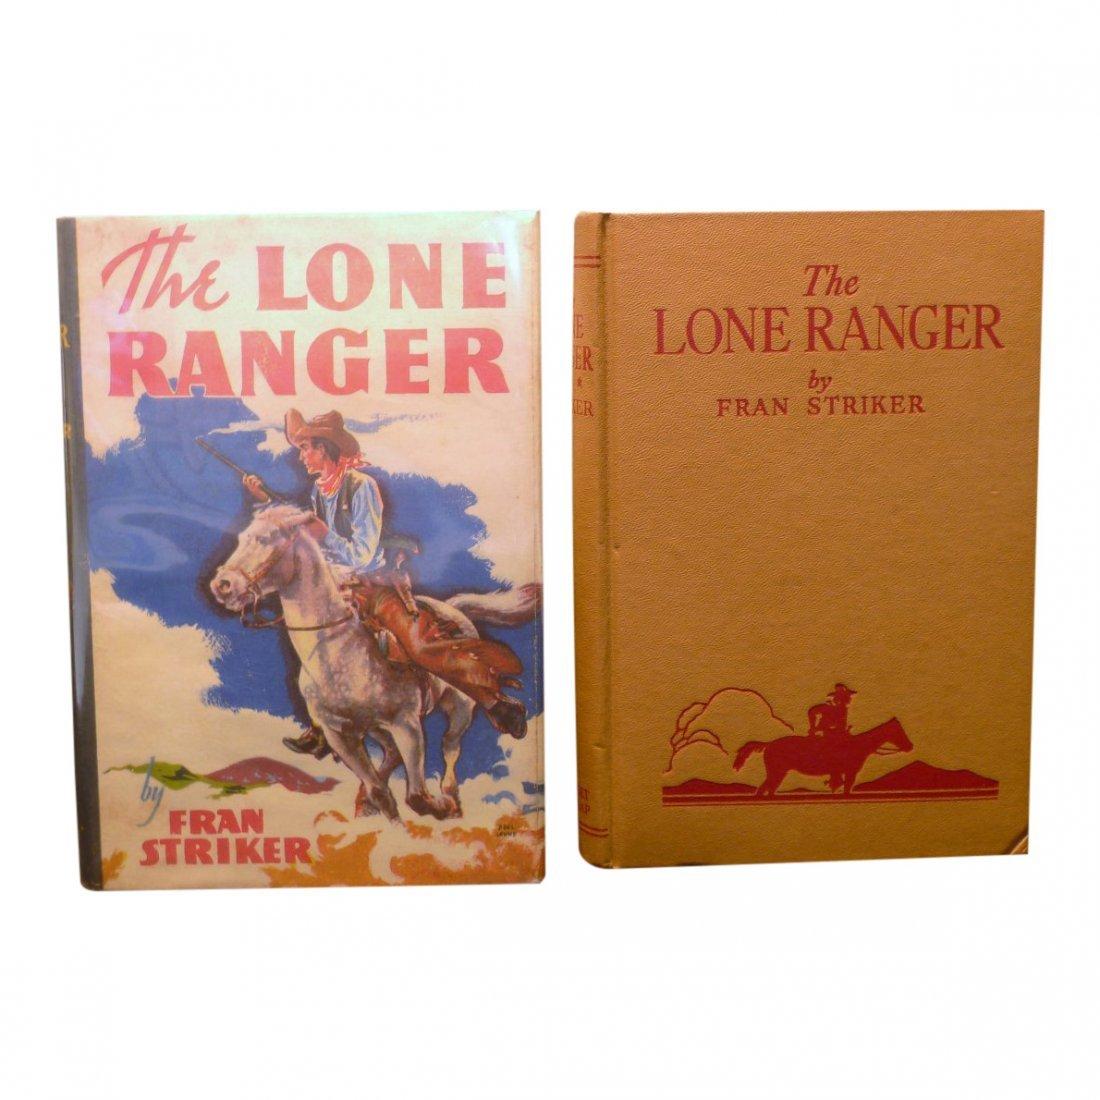 Fran Striker: The Lone Ranger - Signed